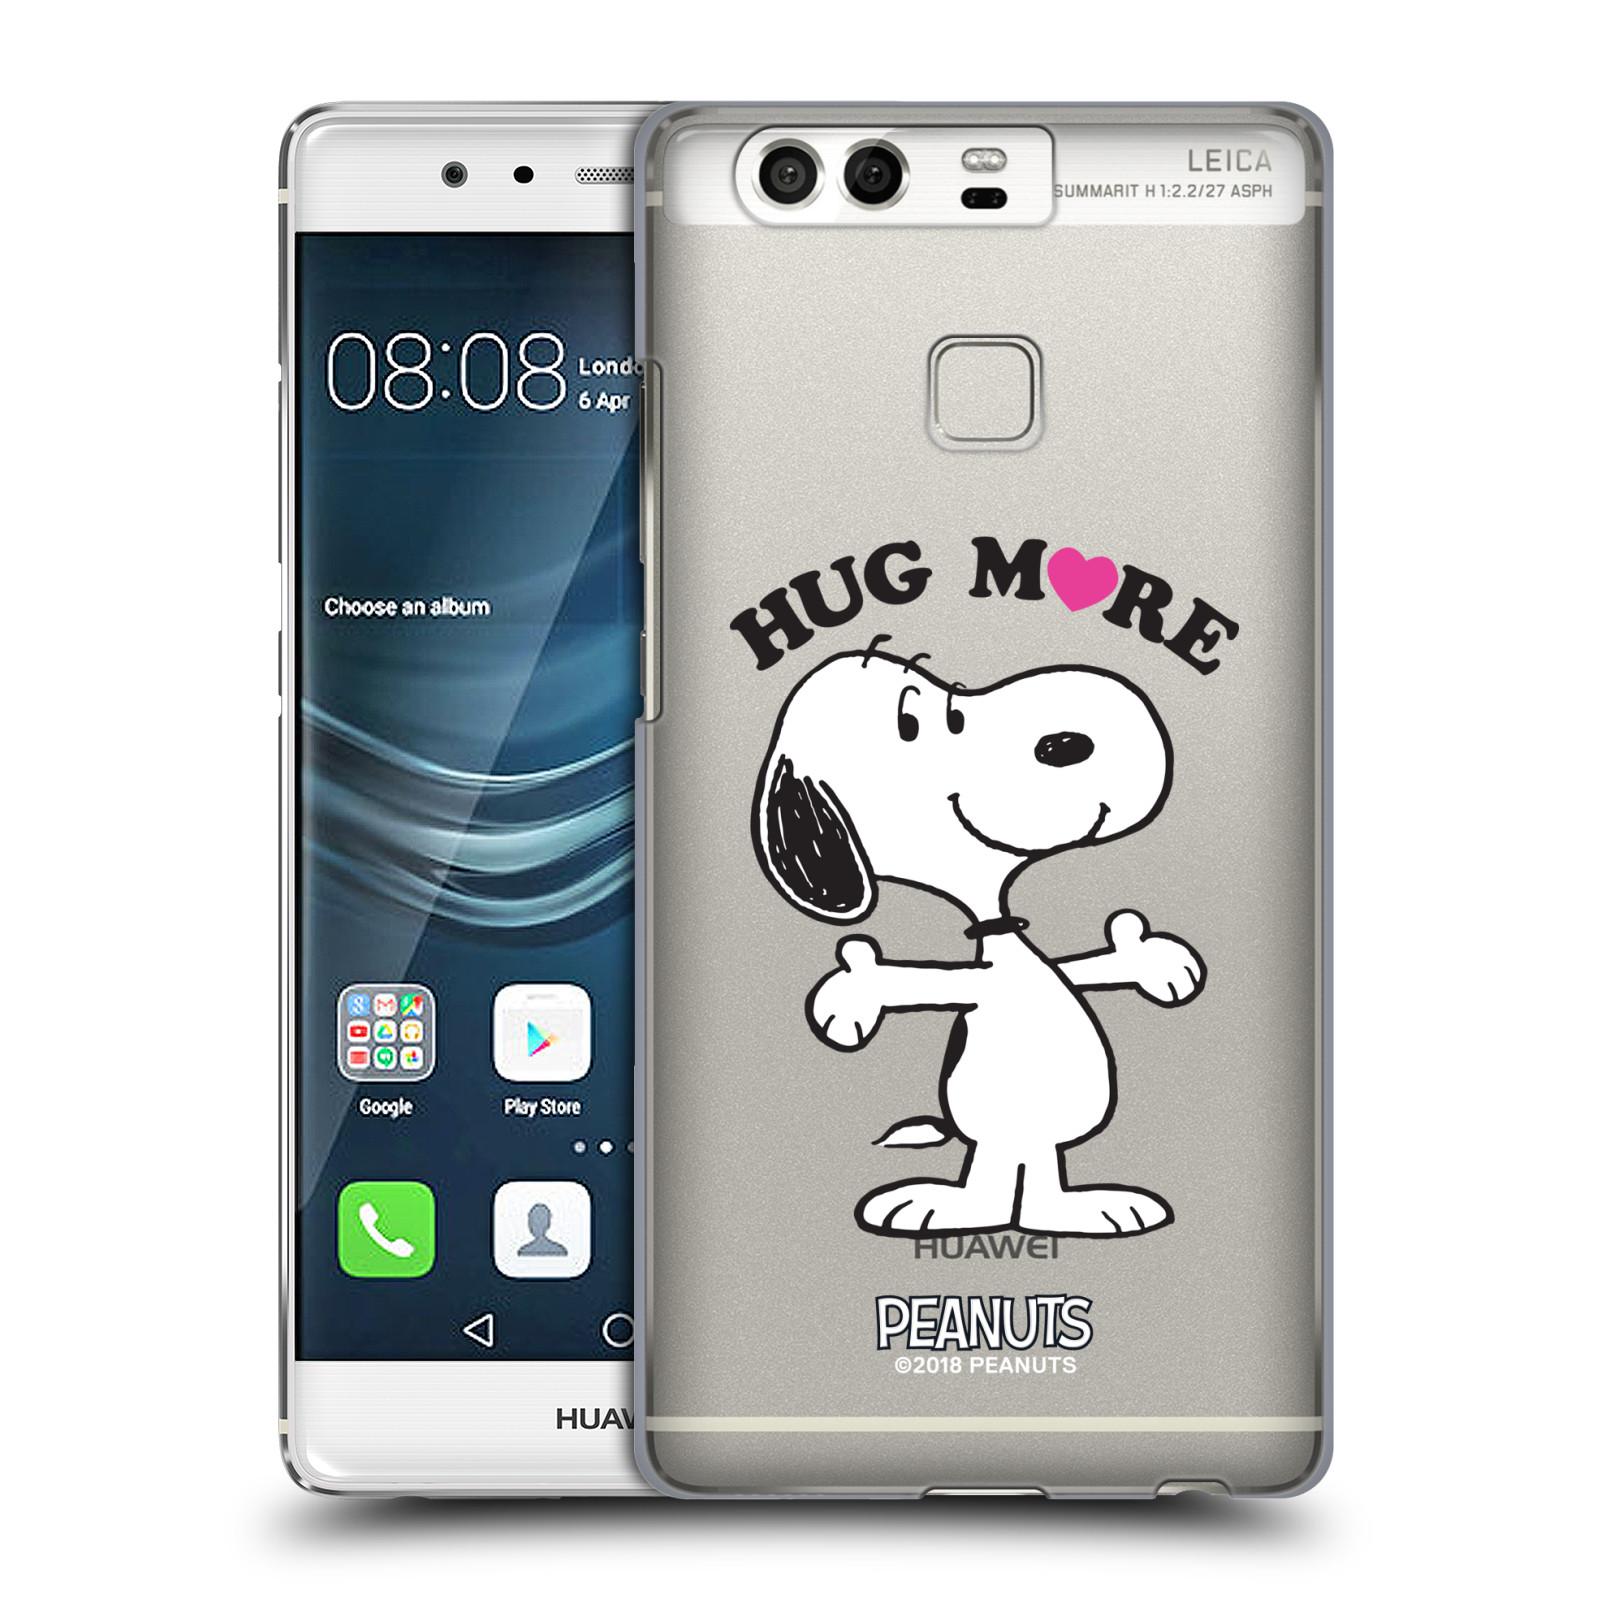 Pouzdro na mobil Huawei P9 / P9 DUAL SIM Oficiální motiv Peanuts pejsek Snoopy srdíčko